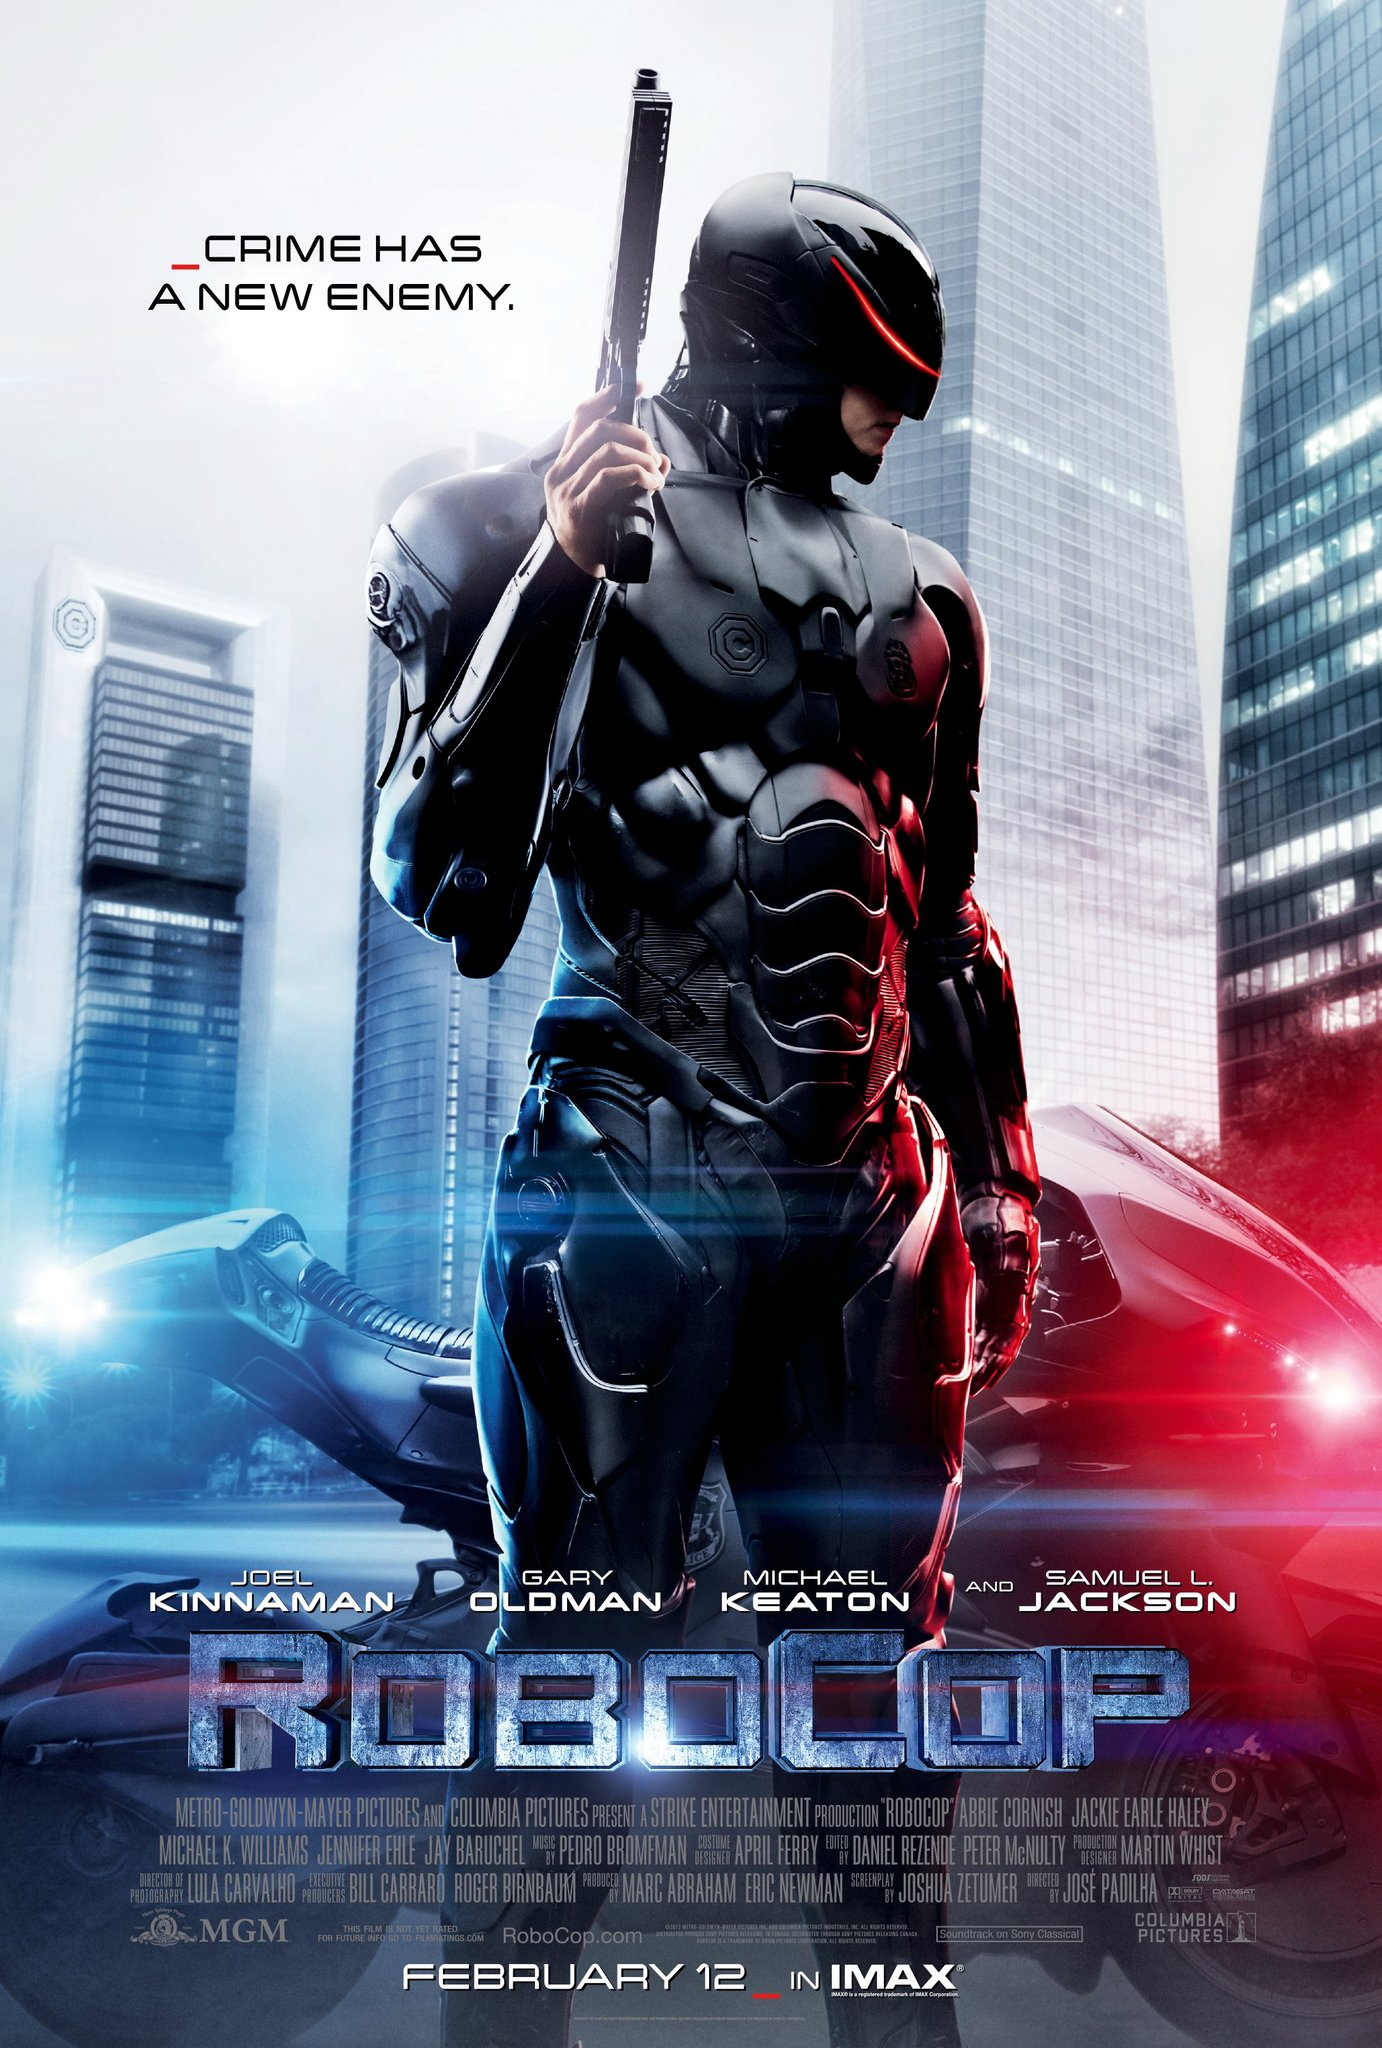 robocop-2014-movie-poster-image.jpg